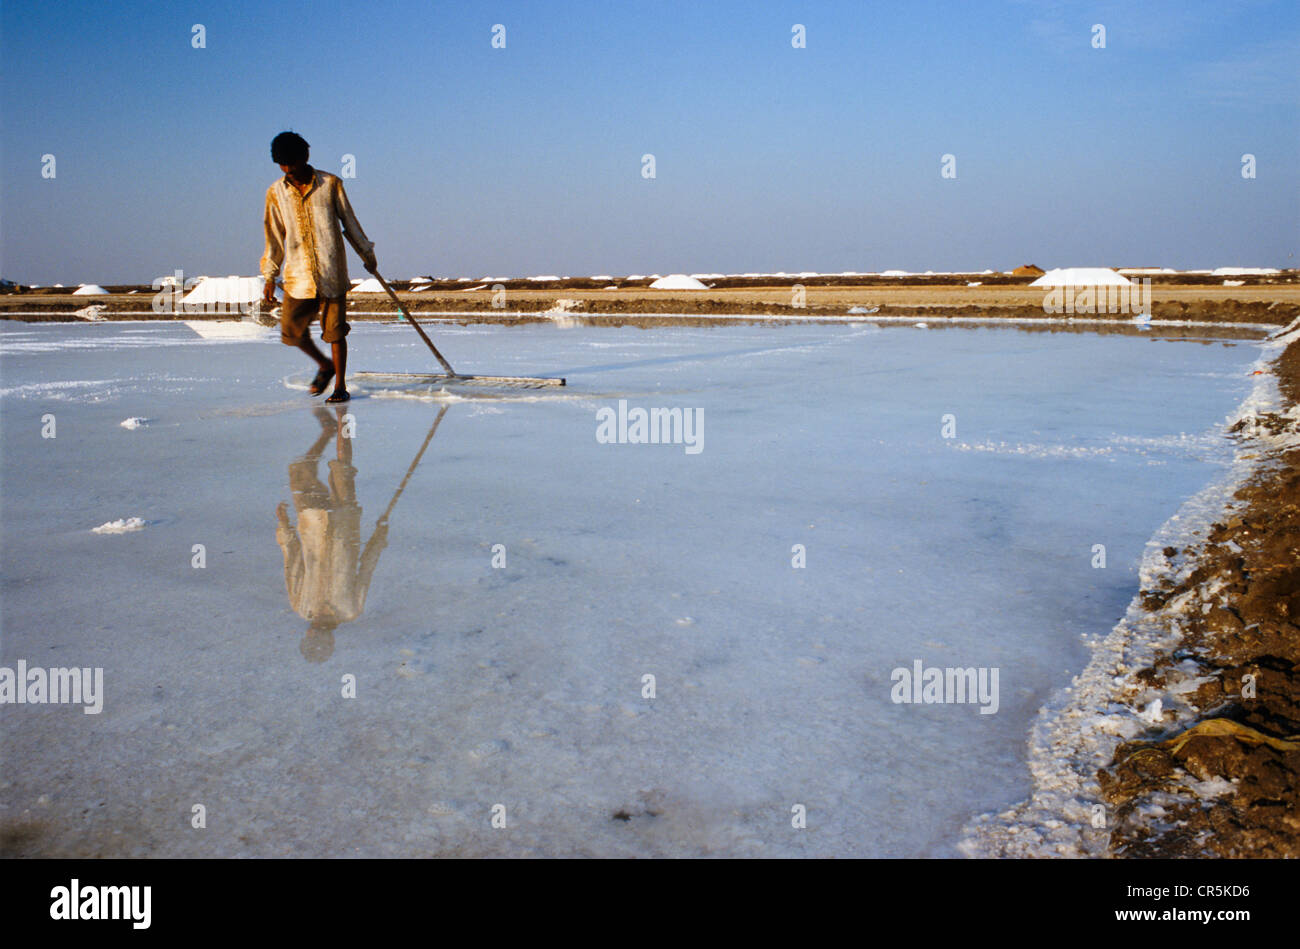 Worker in the saltpans, Malya, Gujarat, India, Asia Stock Photo